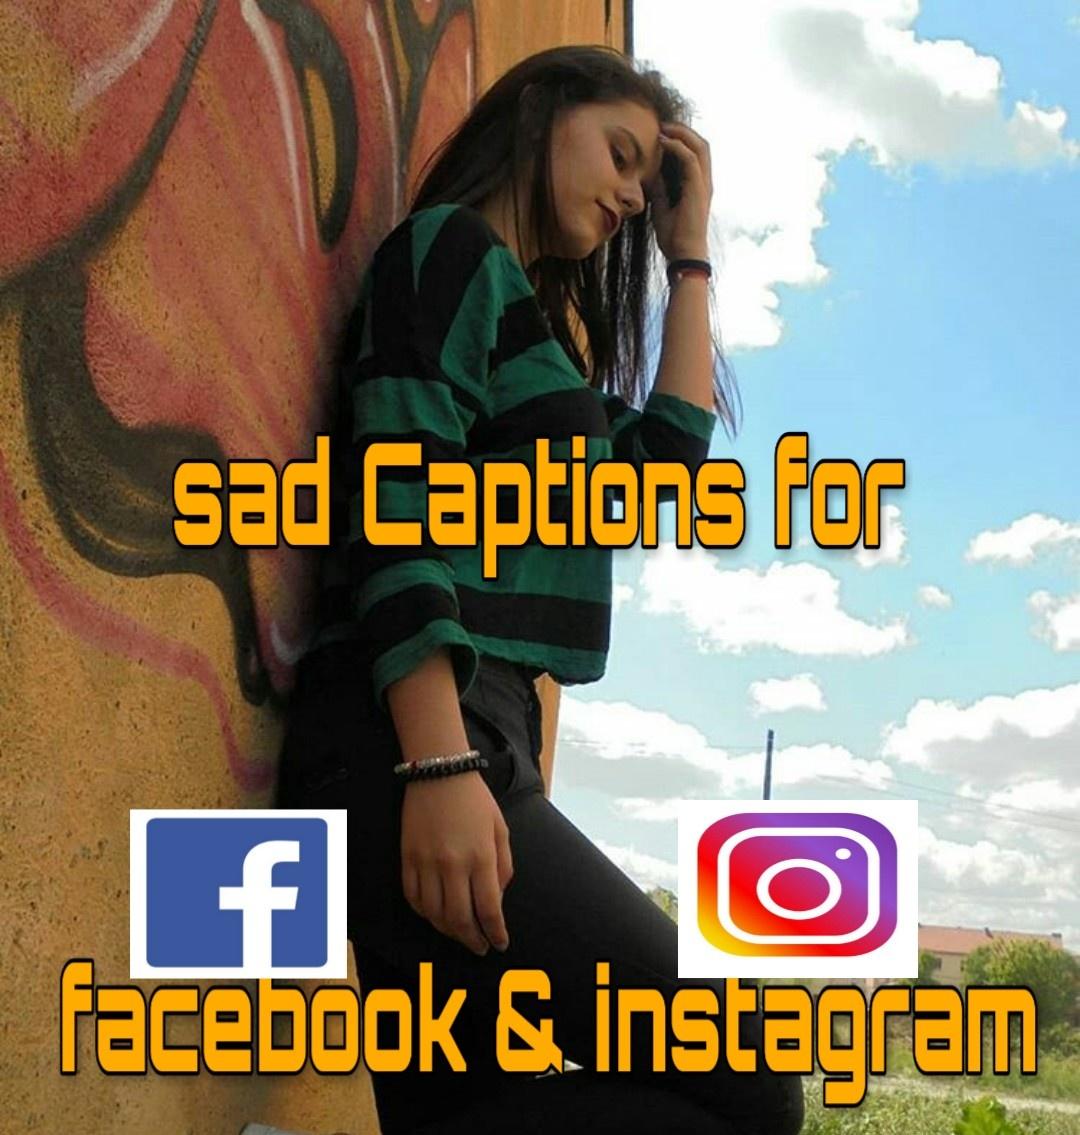 Bengali Sad Caption For Facebook fb dp Best Bengali Sad Love Caption